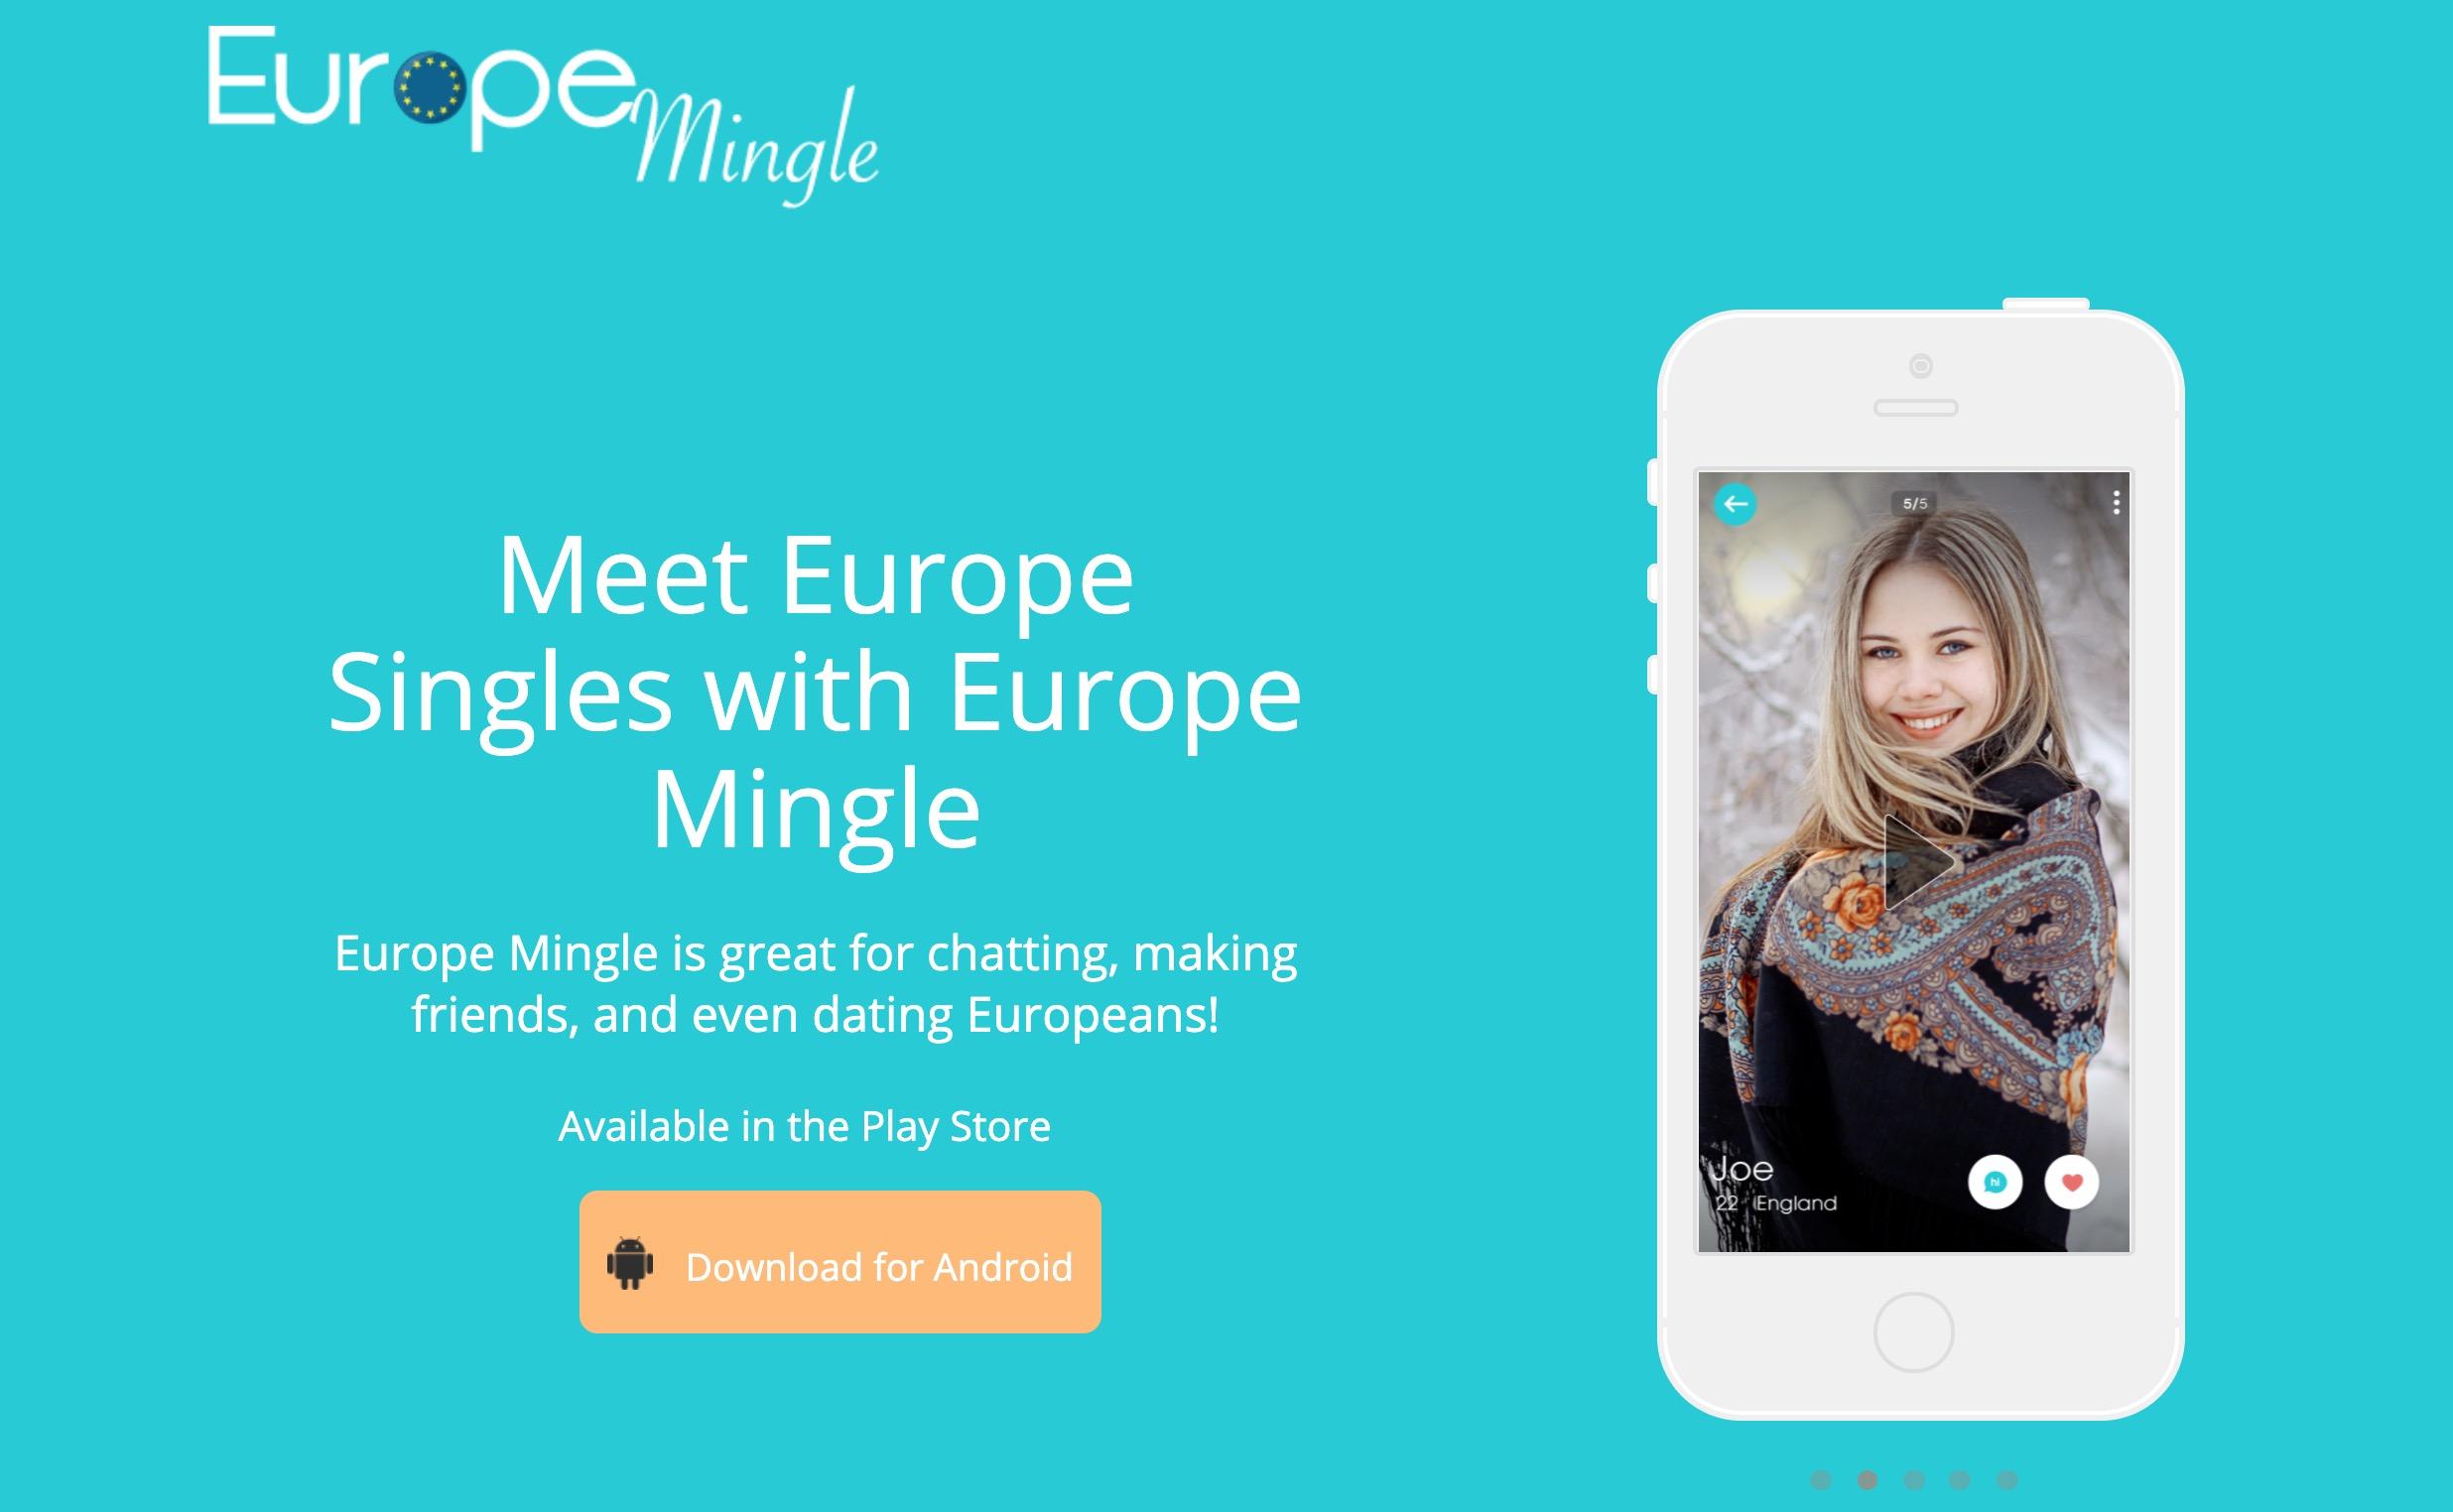 Europe Mingle main page